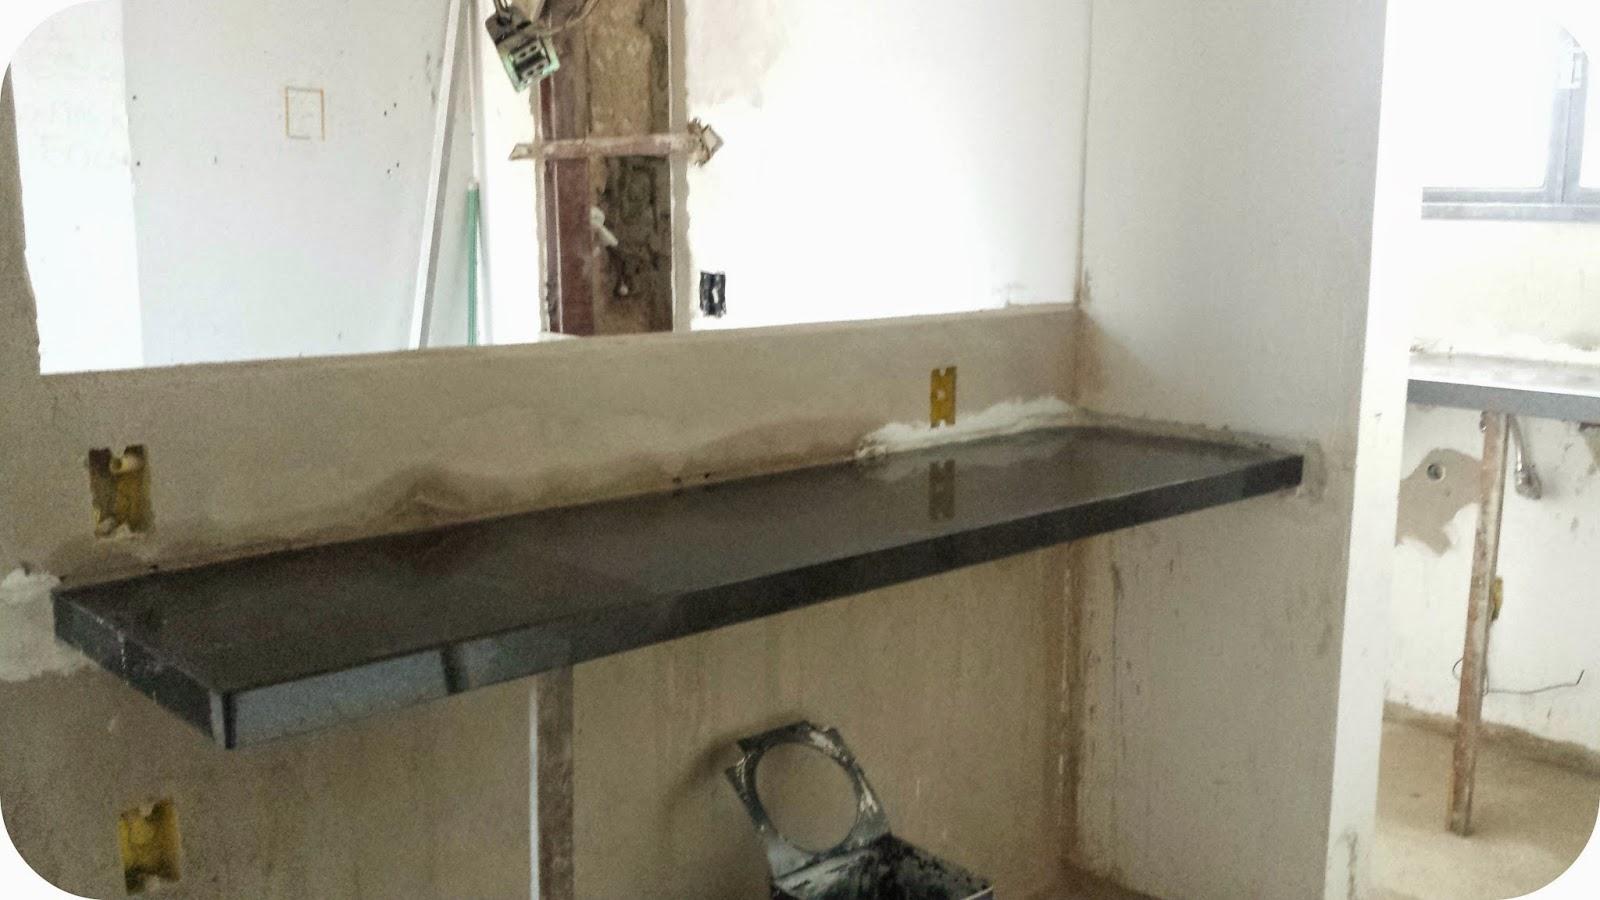 cozinha americana bancada de granito #5C503B 1600 900